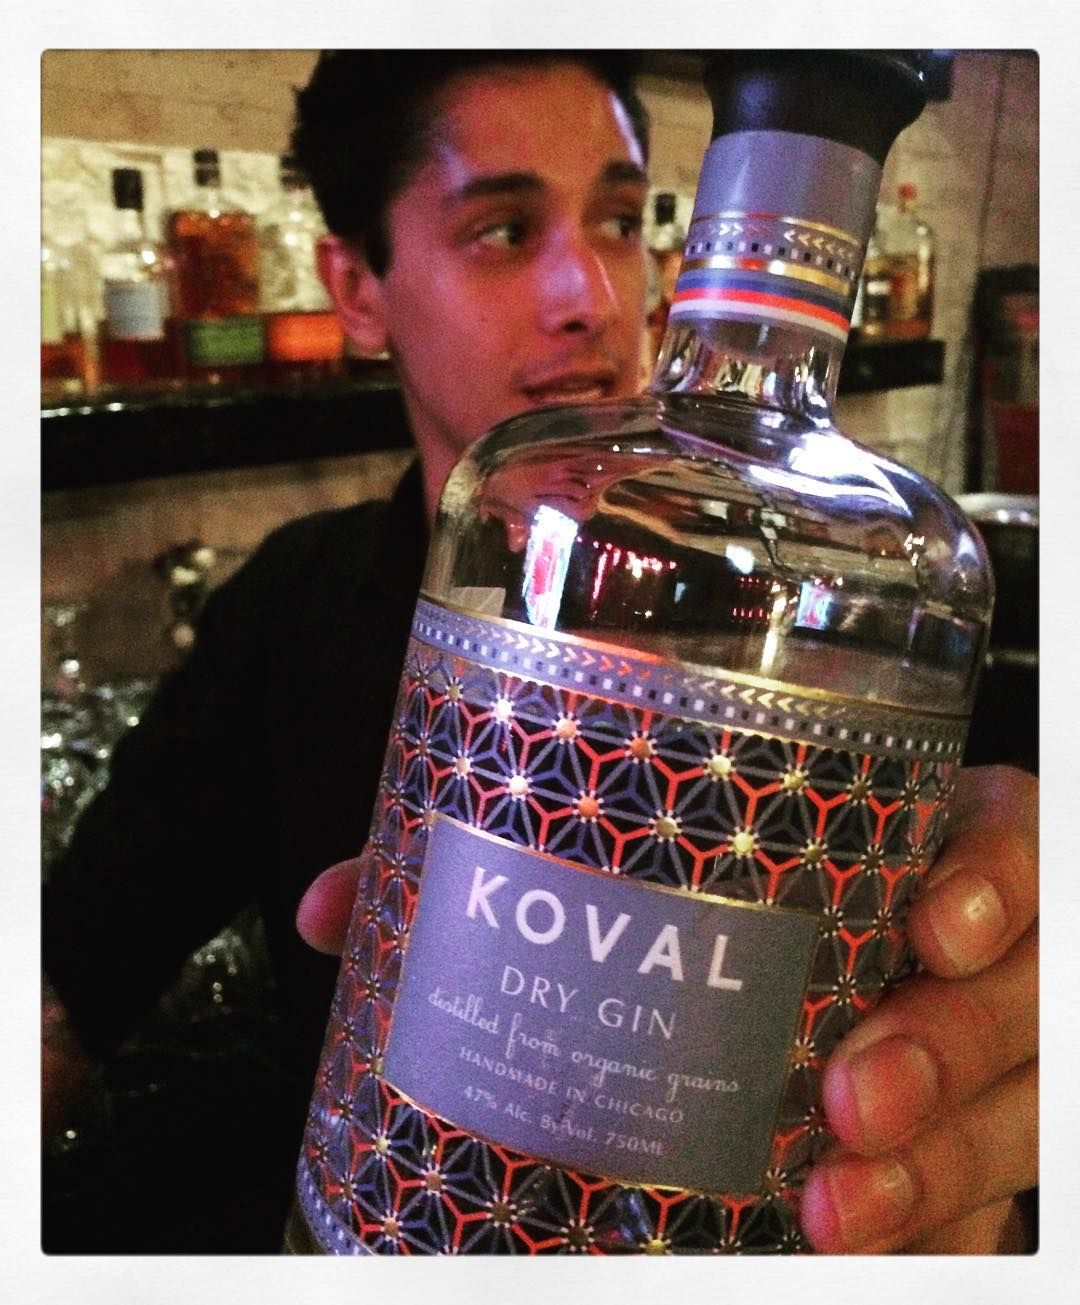 Thank you Kelly!!! I am in love with my new favorite gin!!! @kovaldistillery you guys have an amazing portfolio going on!! // #BobbyBeveridge #gin #chicago #kovaldistillery #barlife #liquor #booze #cocktails #bartender by everyday_roblem